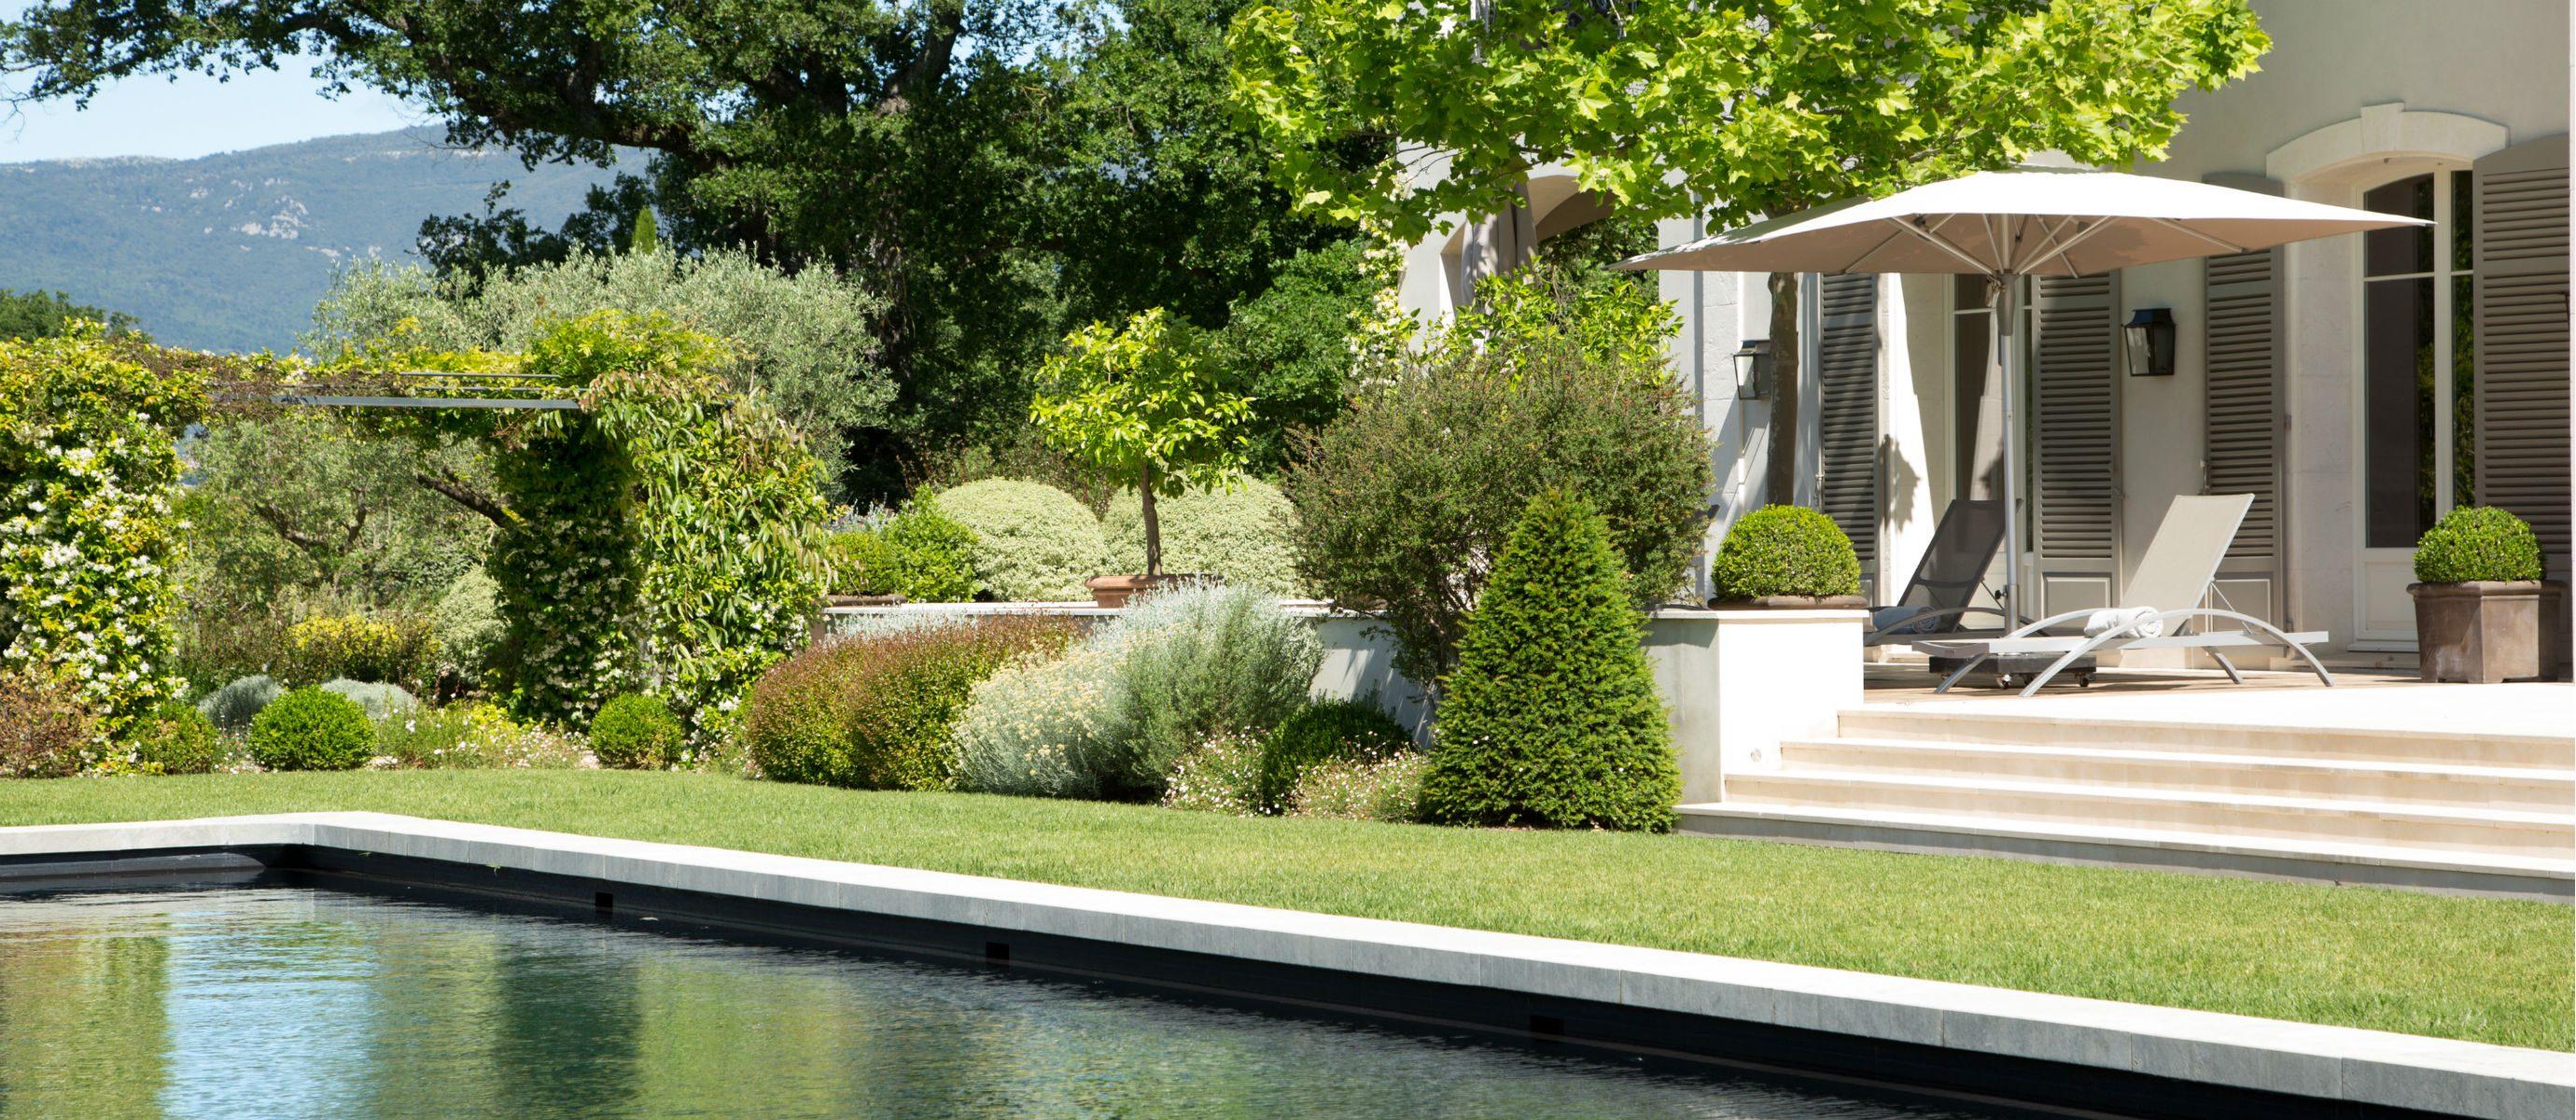 bastide terre blanche french riviera. Black Bedroom Furniture Sets. Home Design Ideas